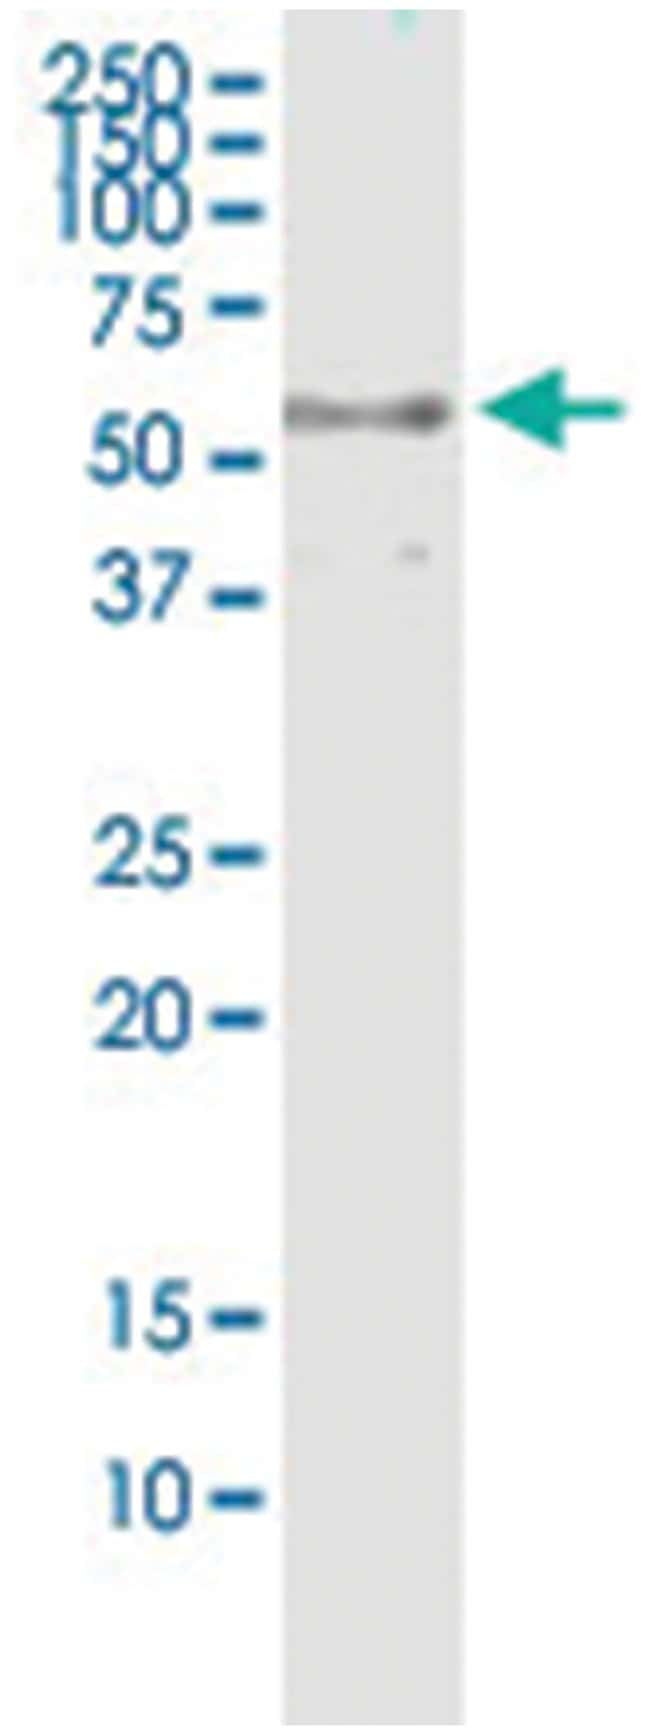 anti-DYNC1LI2, Human, IP-WB Antibody Pair, Abnova 1 Set:Life Sciences